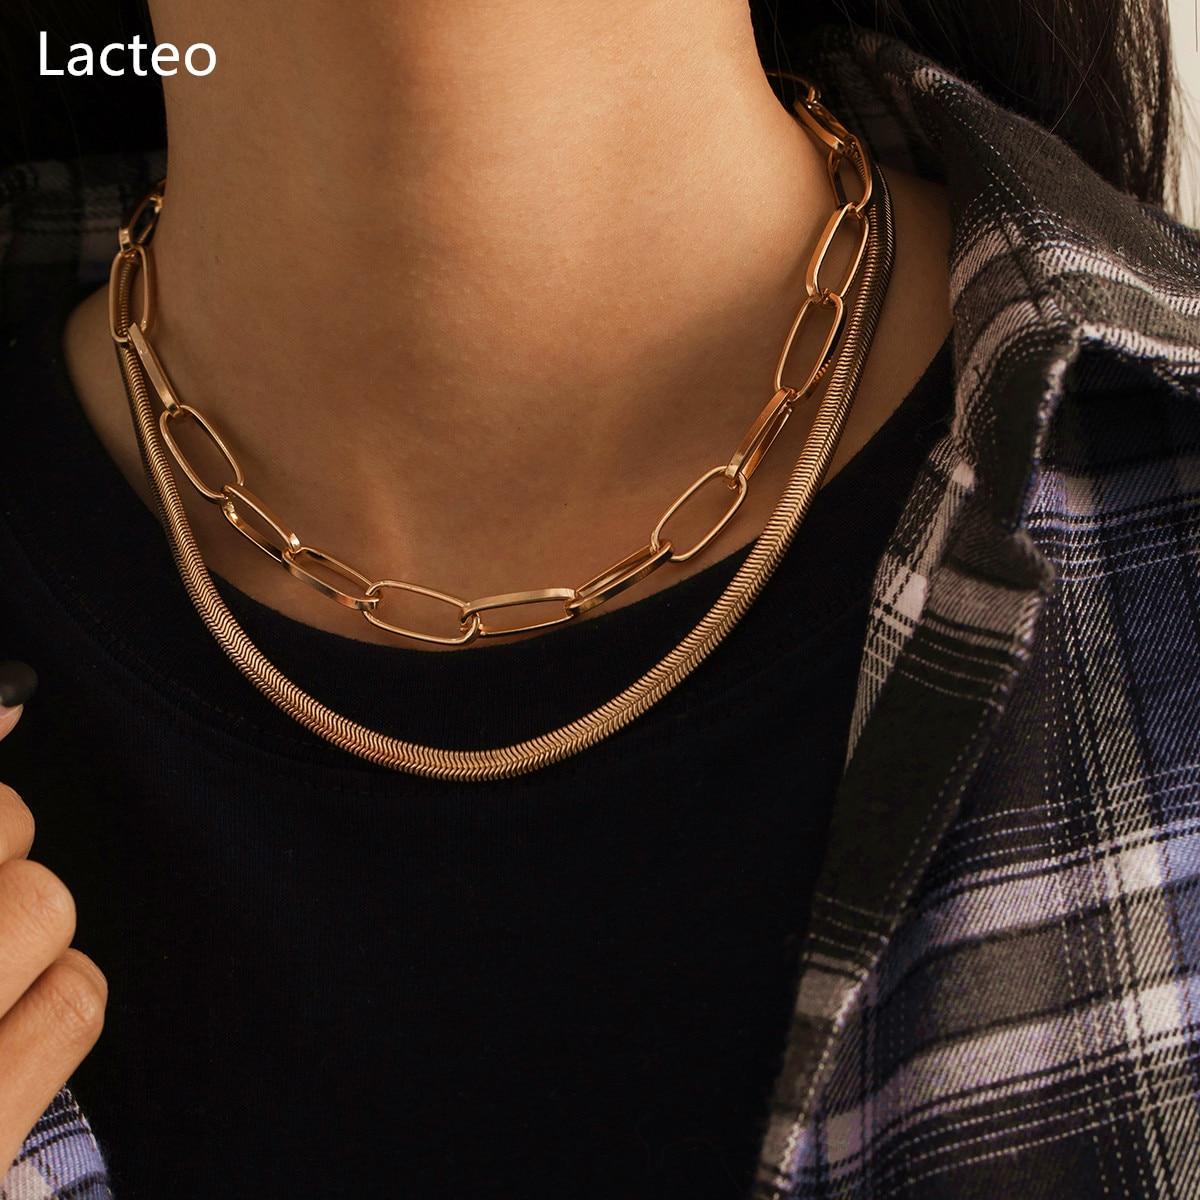 Lacteo 2Pcs/Set Punk Snake Bone Chain Clavicle Choker Necklace Simple Minimalist Jewelry Wearing on the Neck